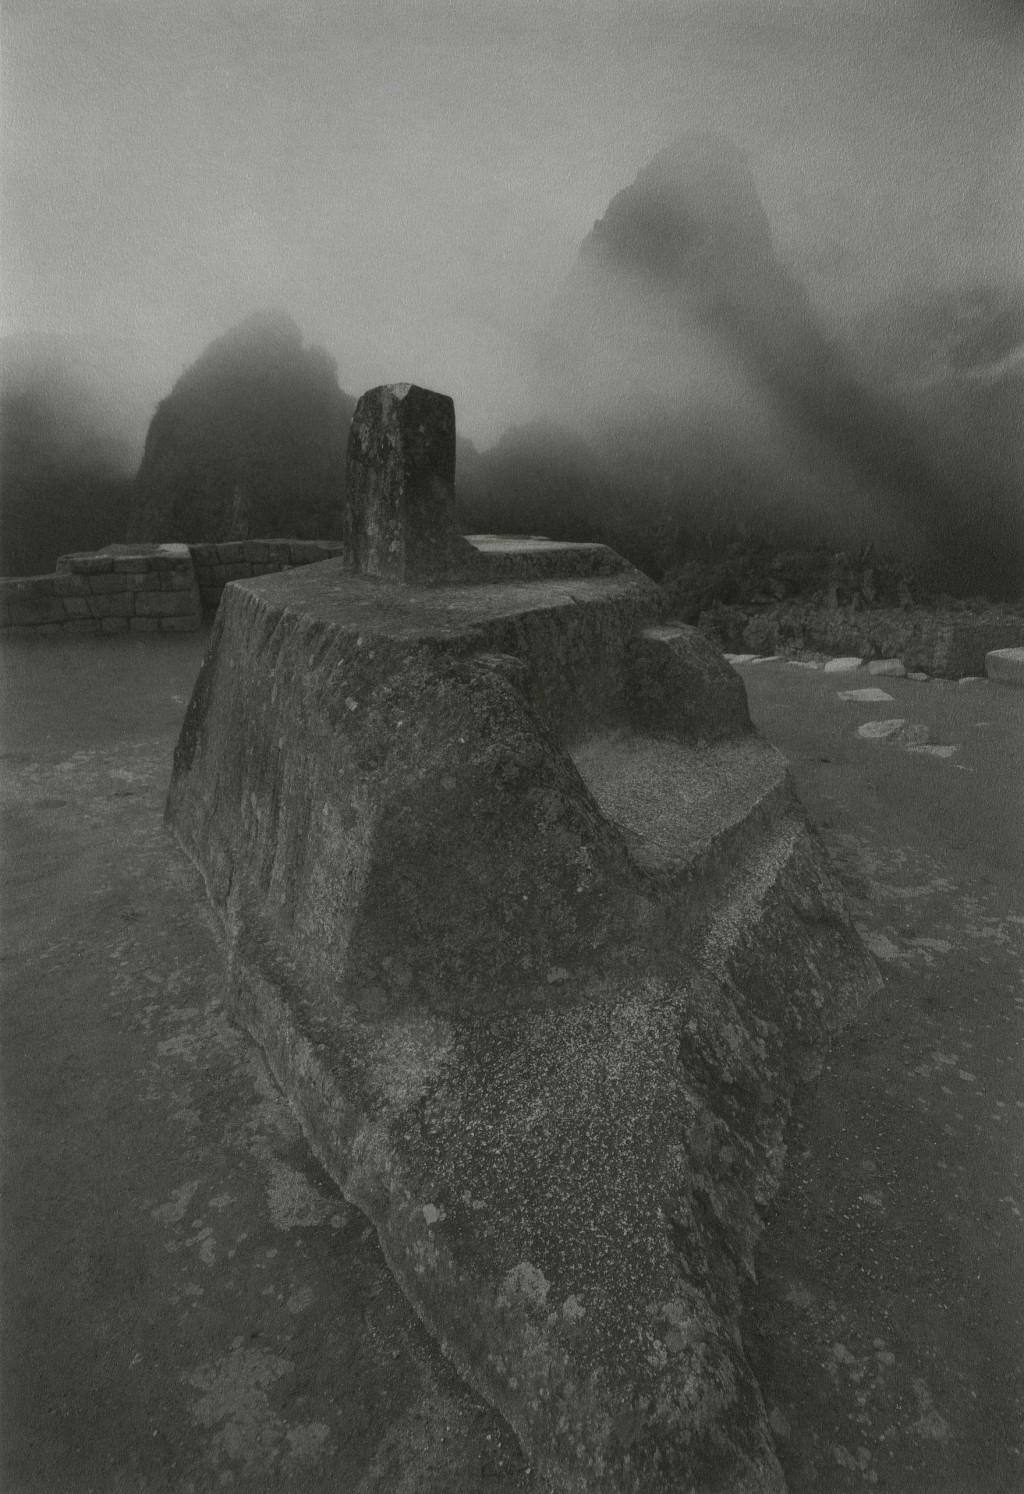 kenro-izu-sacred-places-machu-pichu-31